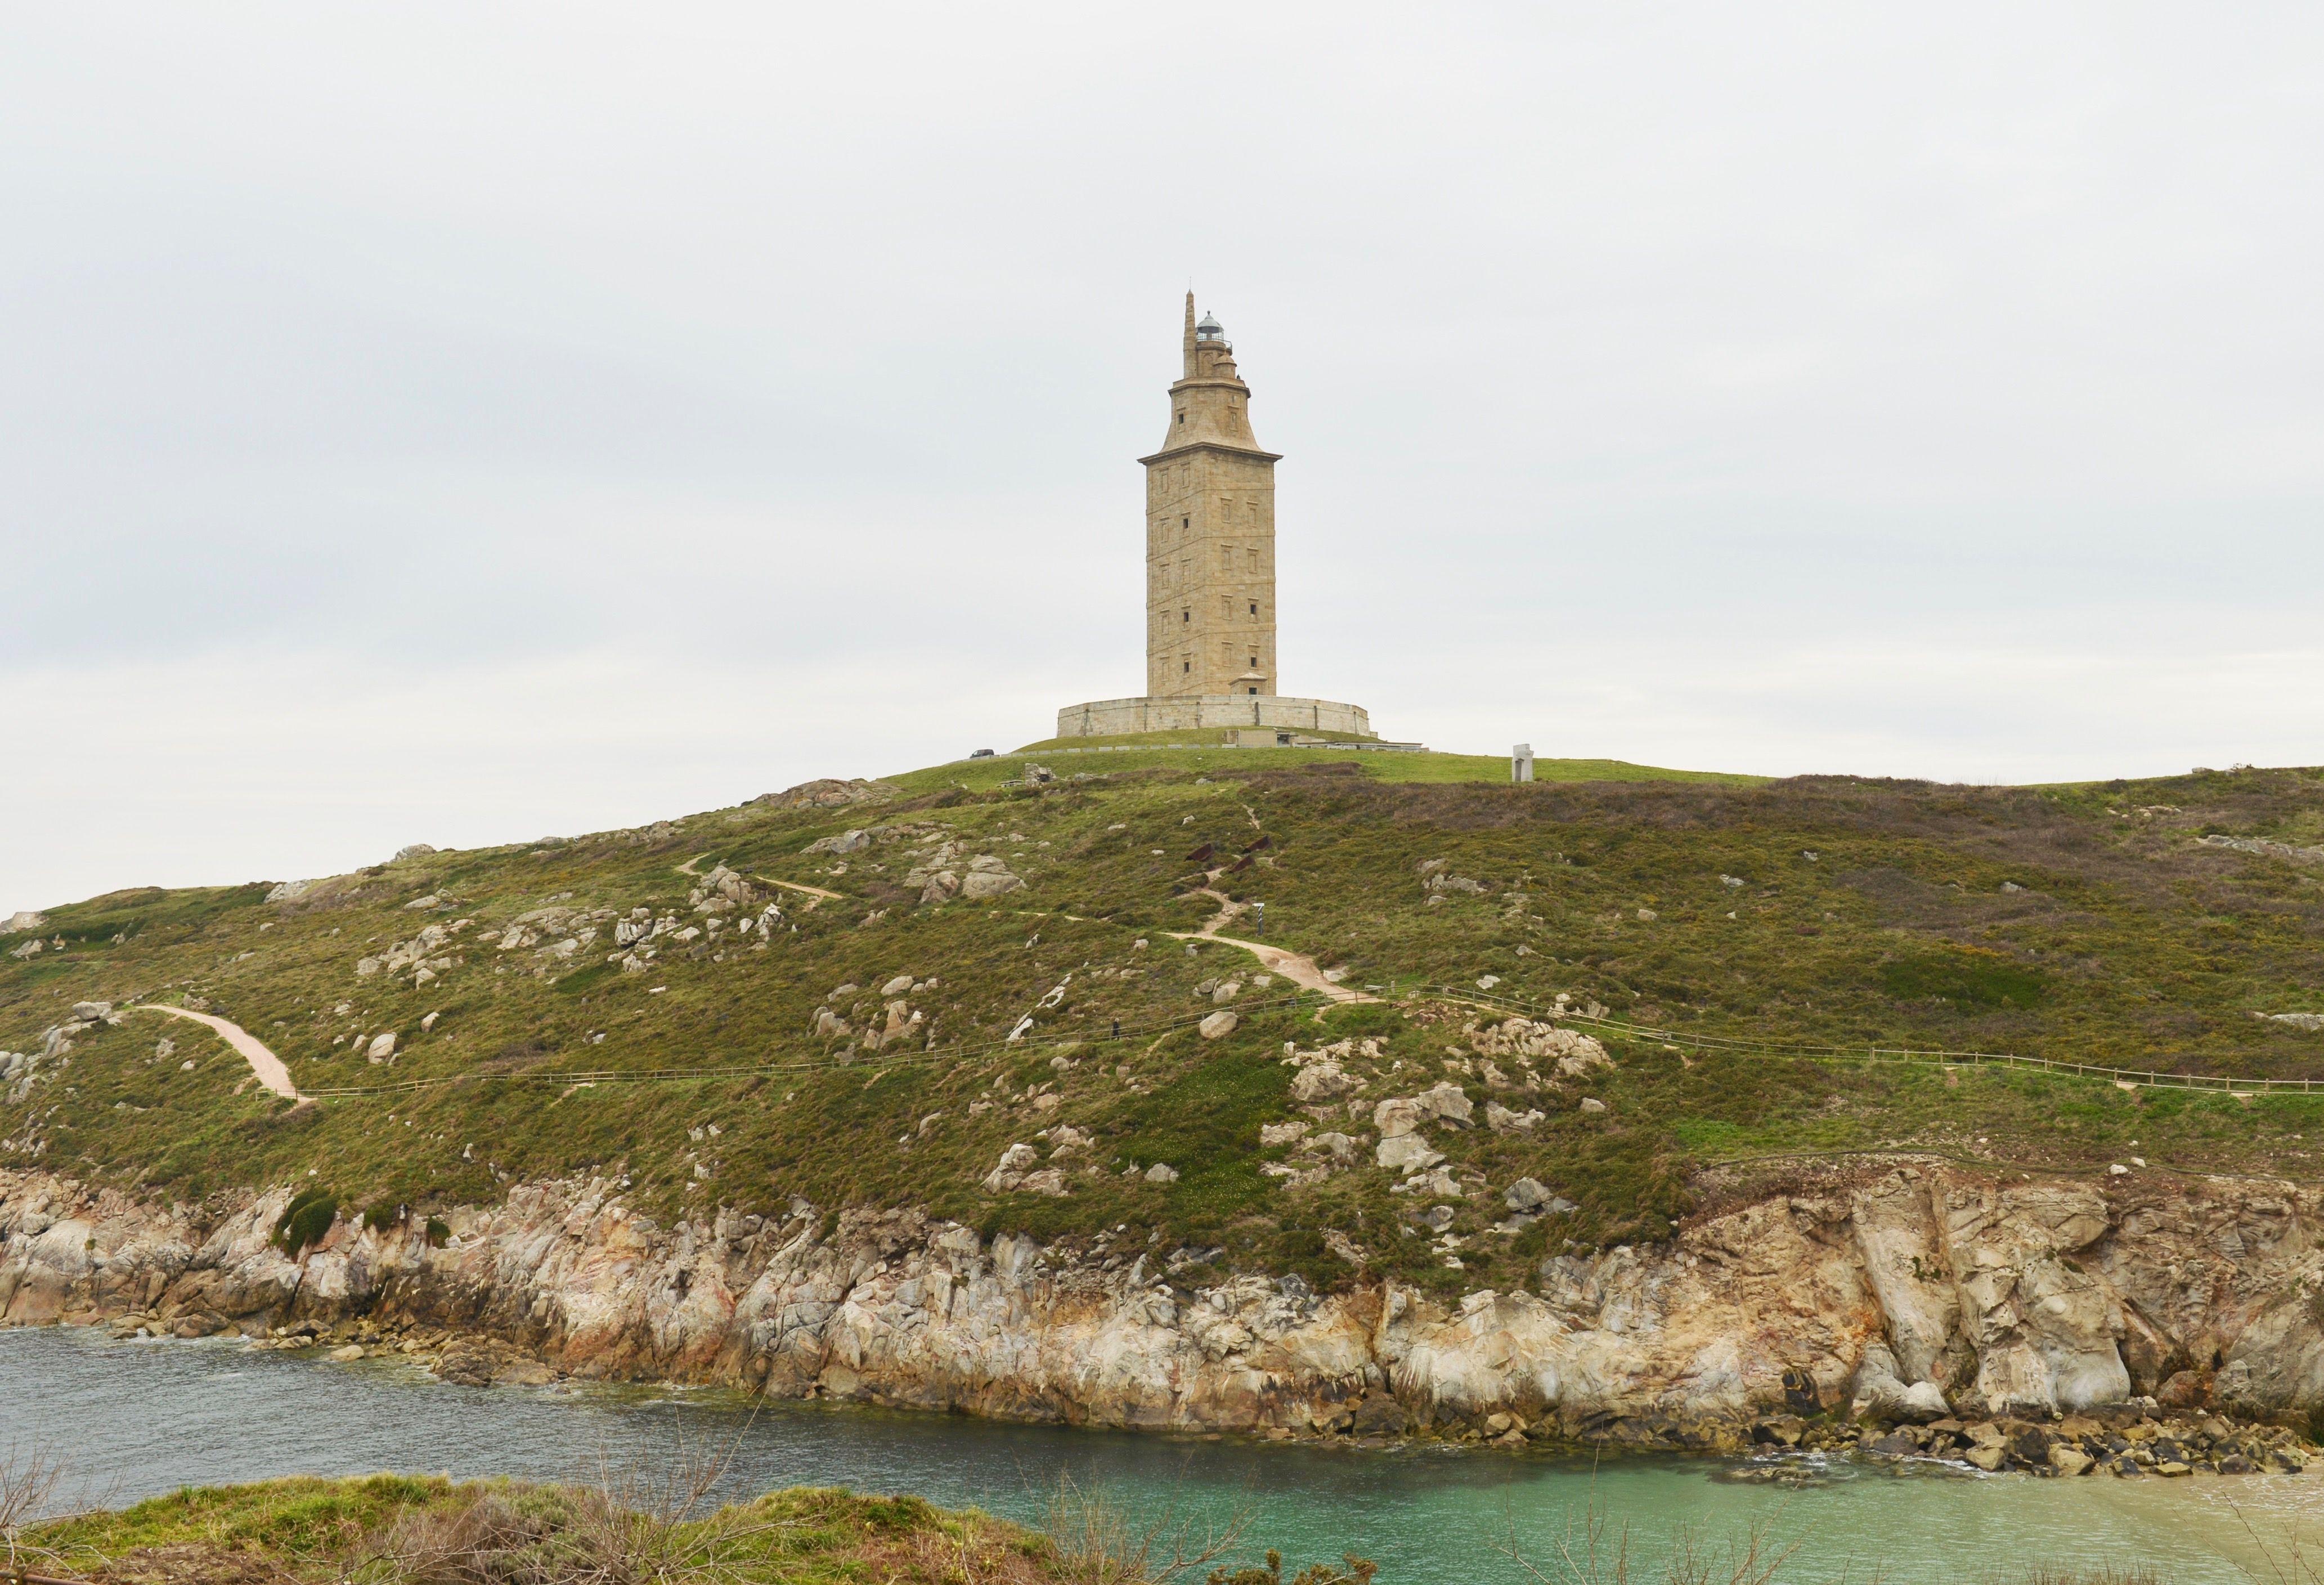 Torre de Hercules España